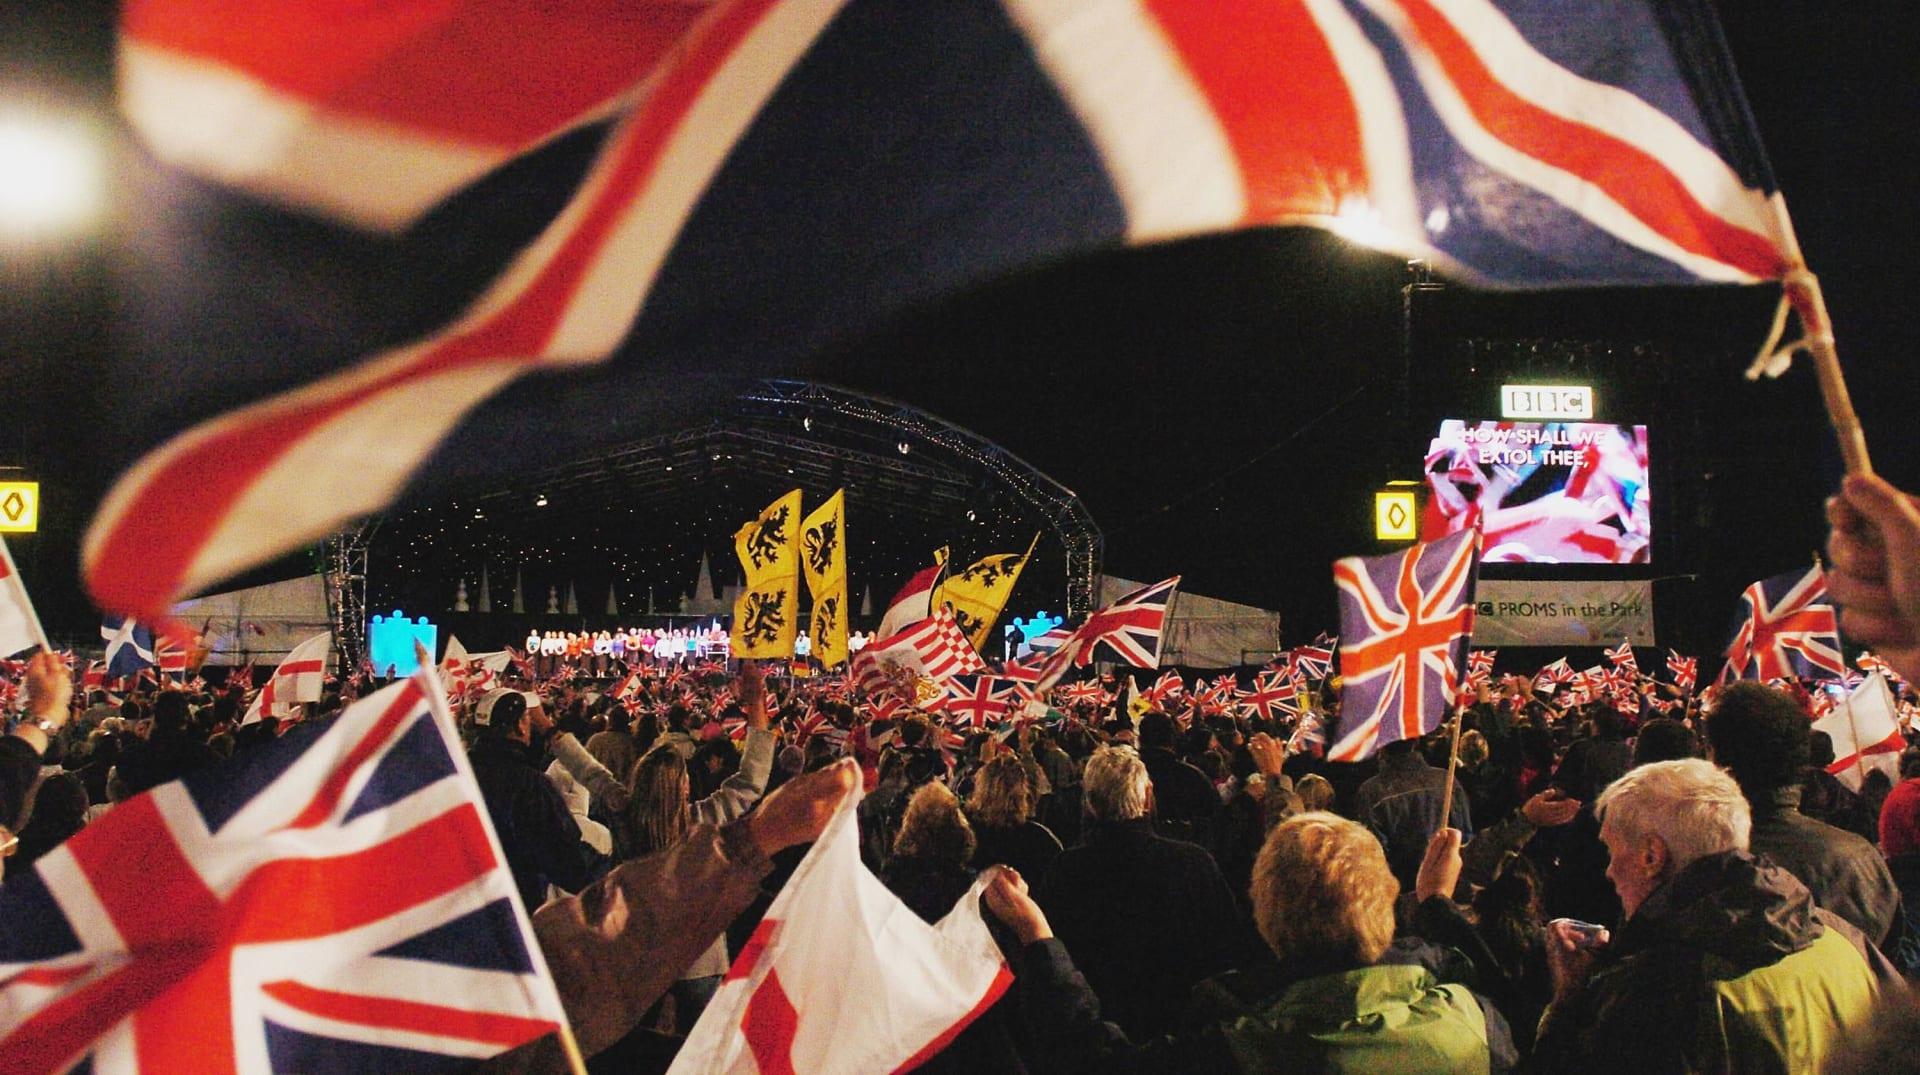 BBC تزيل كلمات أغان وطنية ترتبط بالاستعمار من حفلاتها السنوية